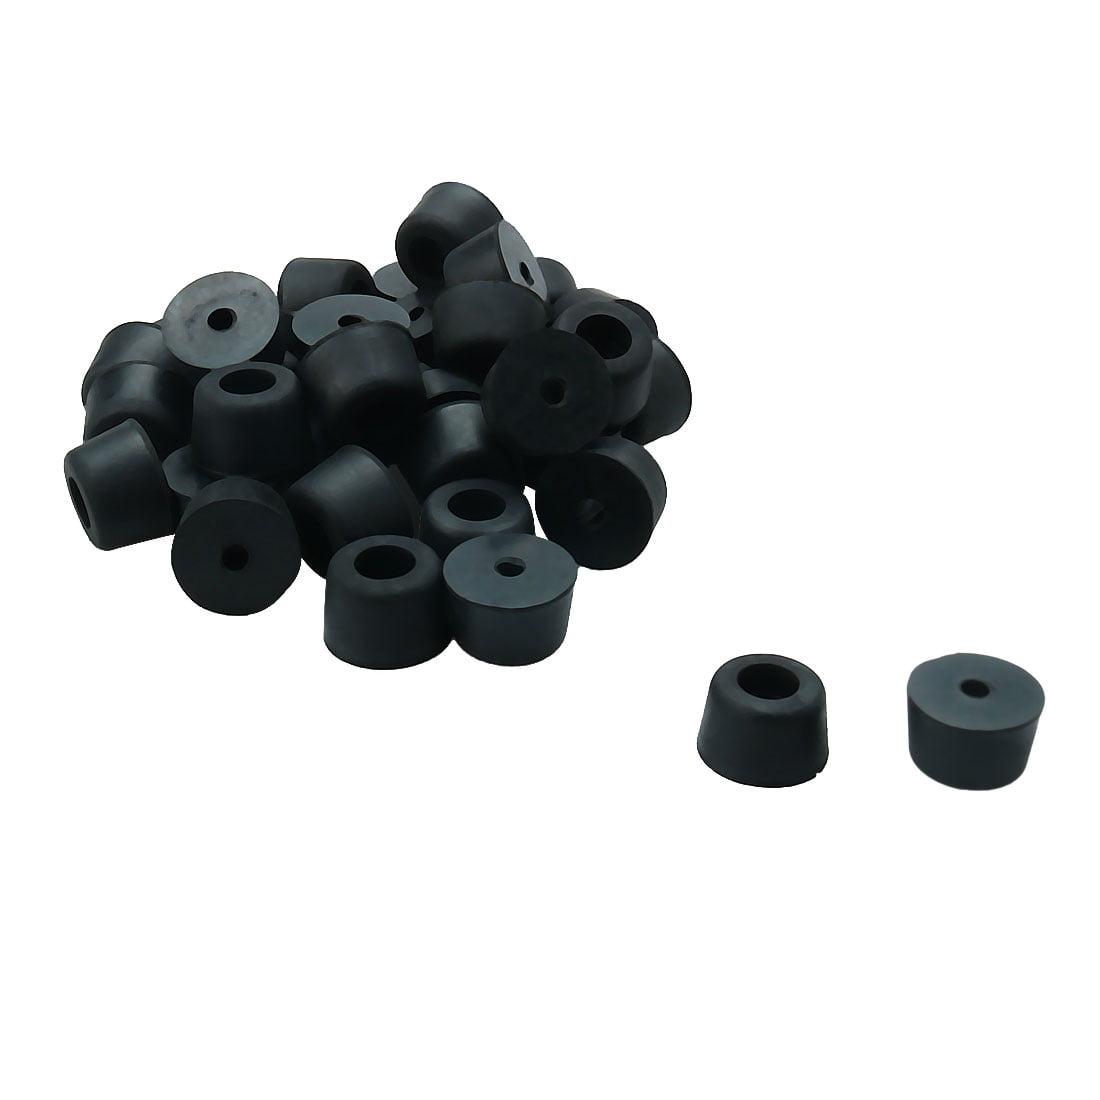 32pcs Rubber Feet Bumper Speaker Floor Protector for Desk Leg Pad, D14x12xH9mm - image 7 of 7